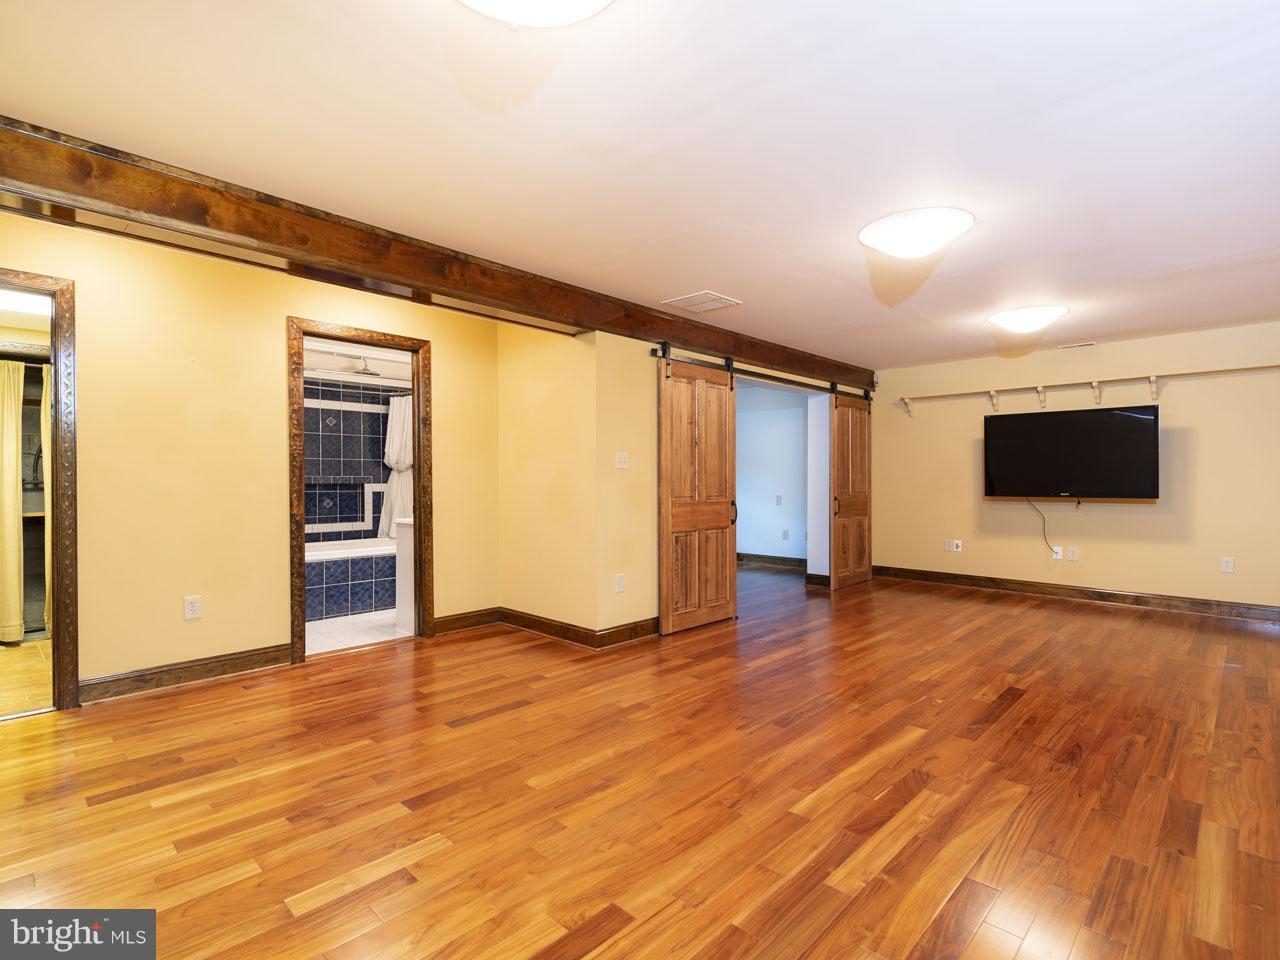 1002303700-300502419409-2021-07-22-03-27-22  |   | Alexandria Delaware Real Estate For Sale | MLS# 1002303700  - Best of Northern Virginia